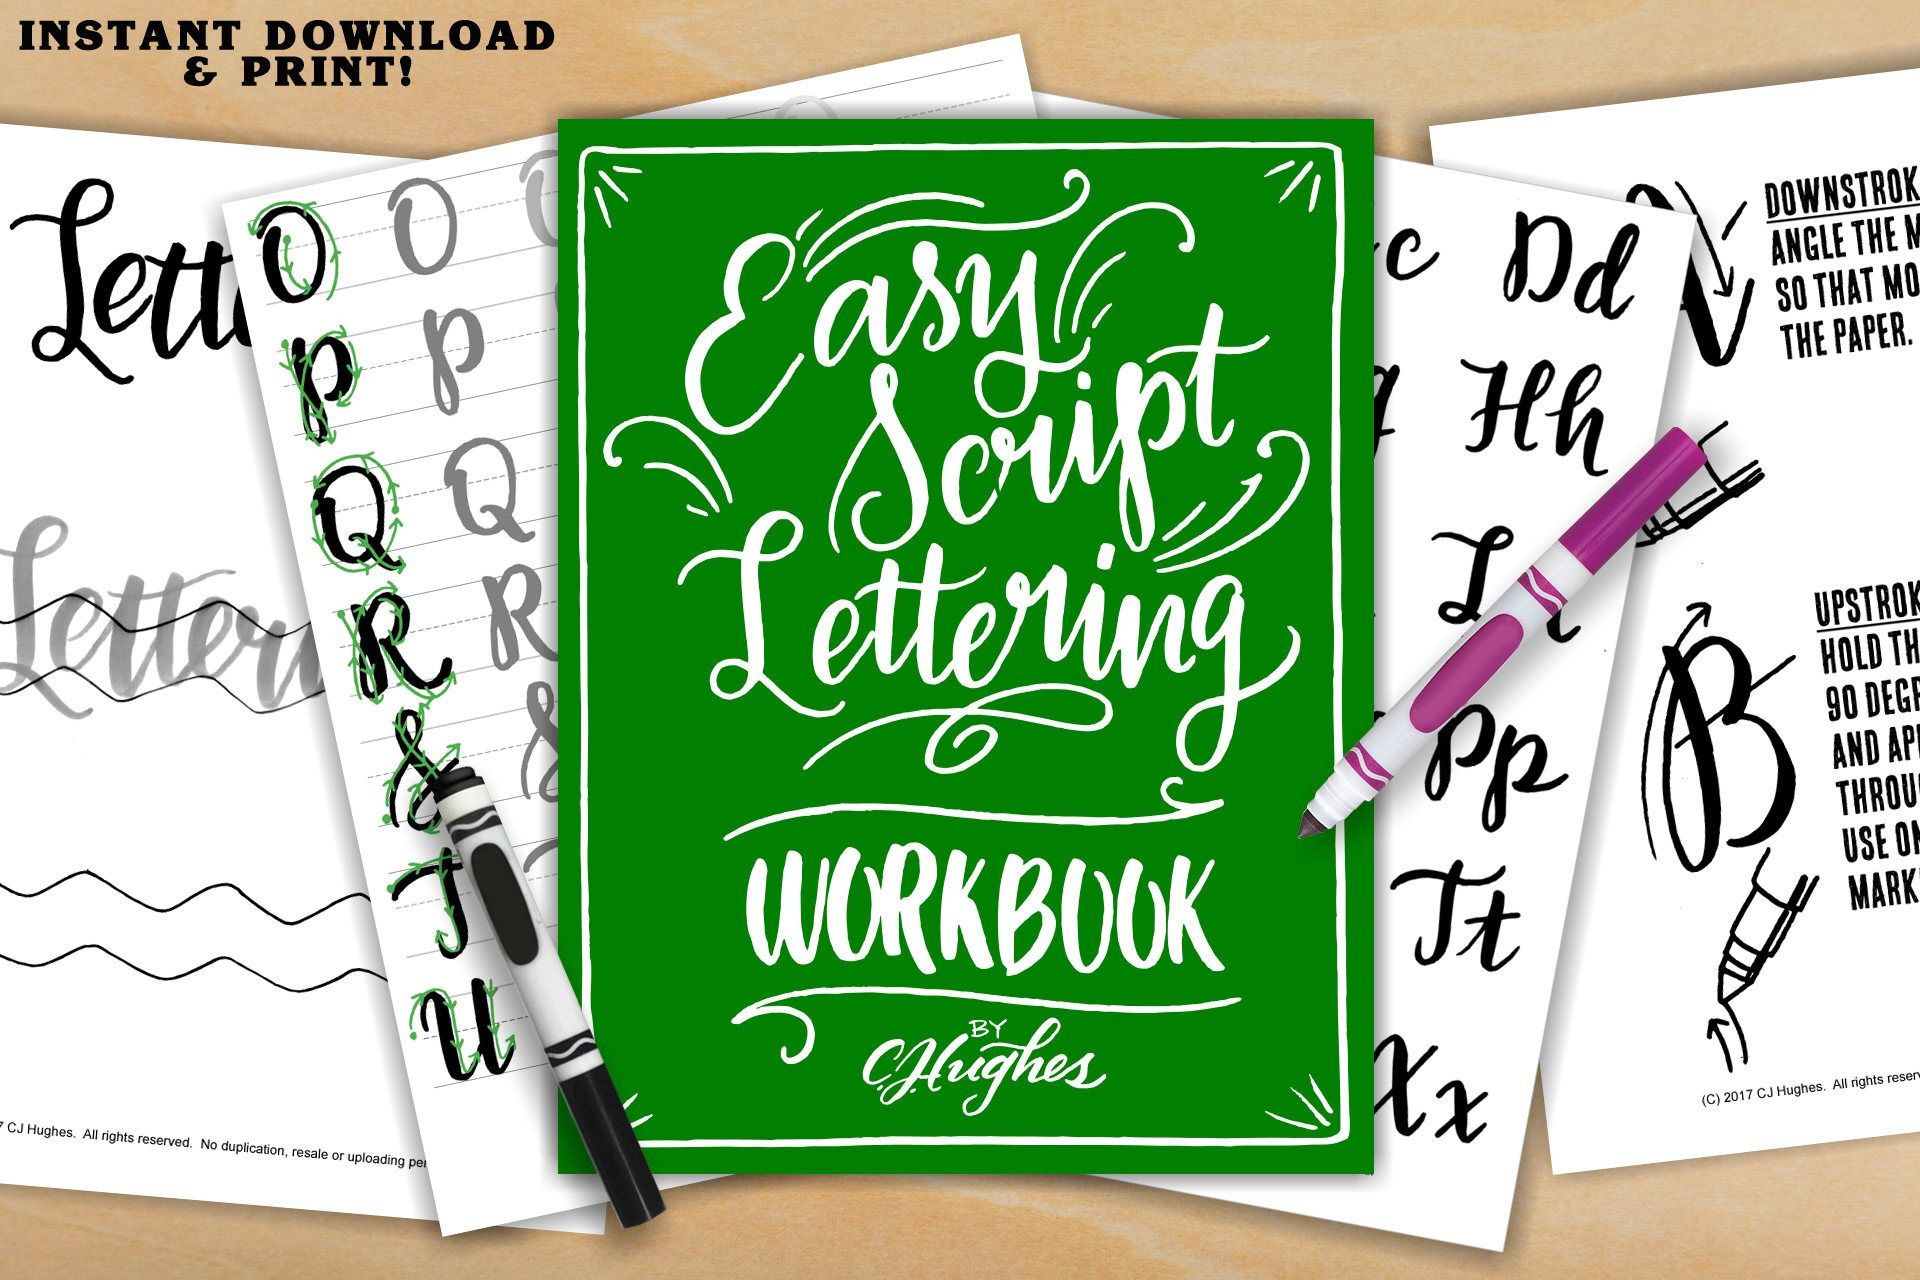 Easy Script Lettering Workbook